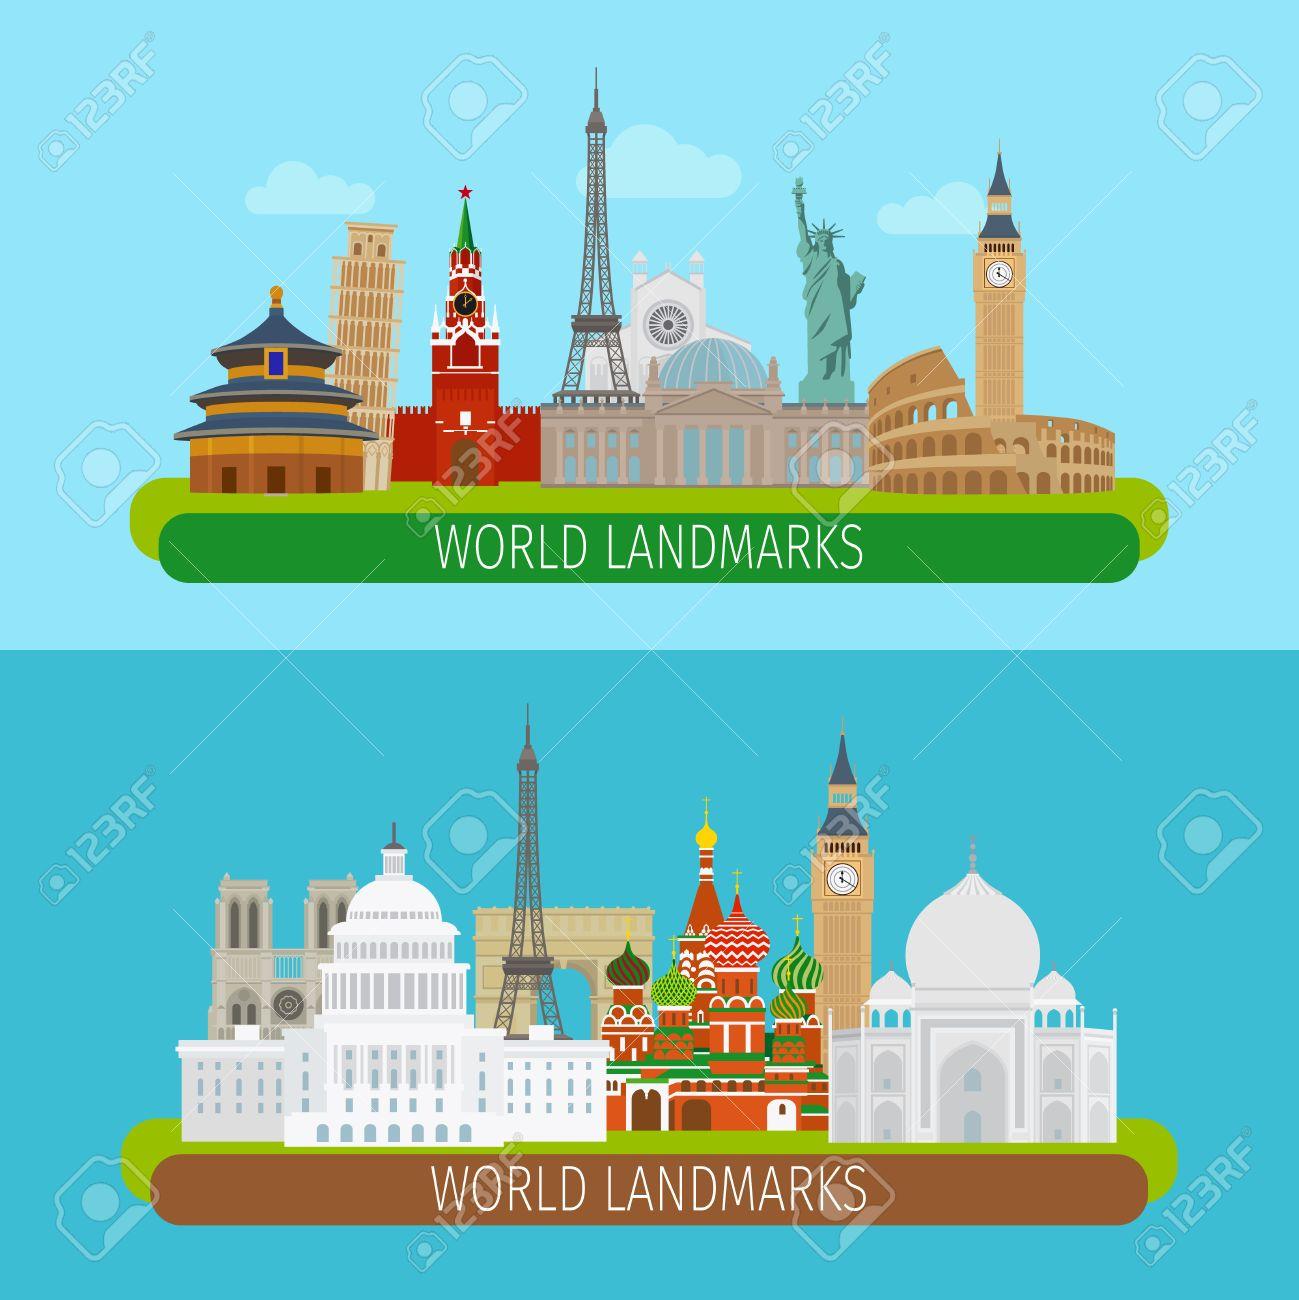 World landmarks banners or travel postcards vector illustration